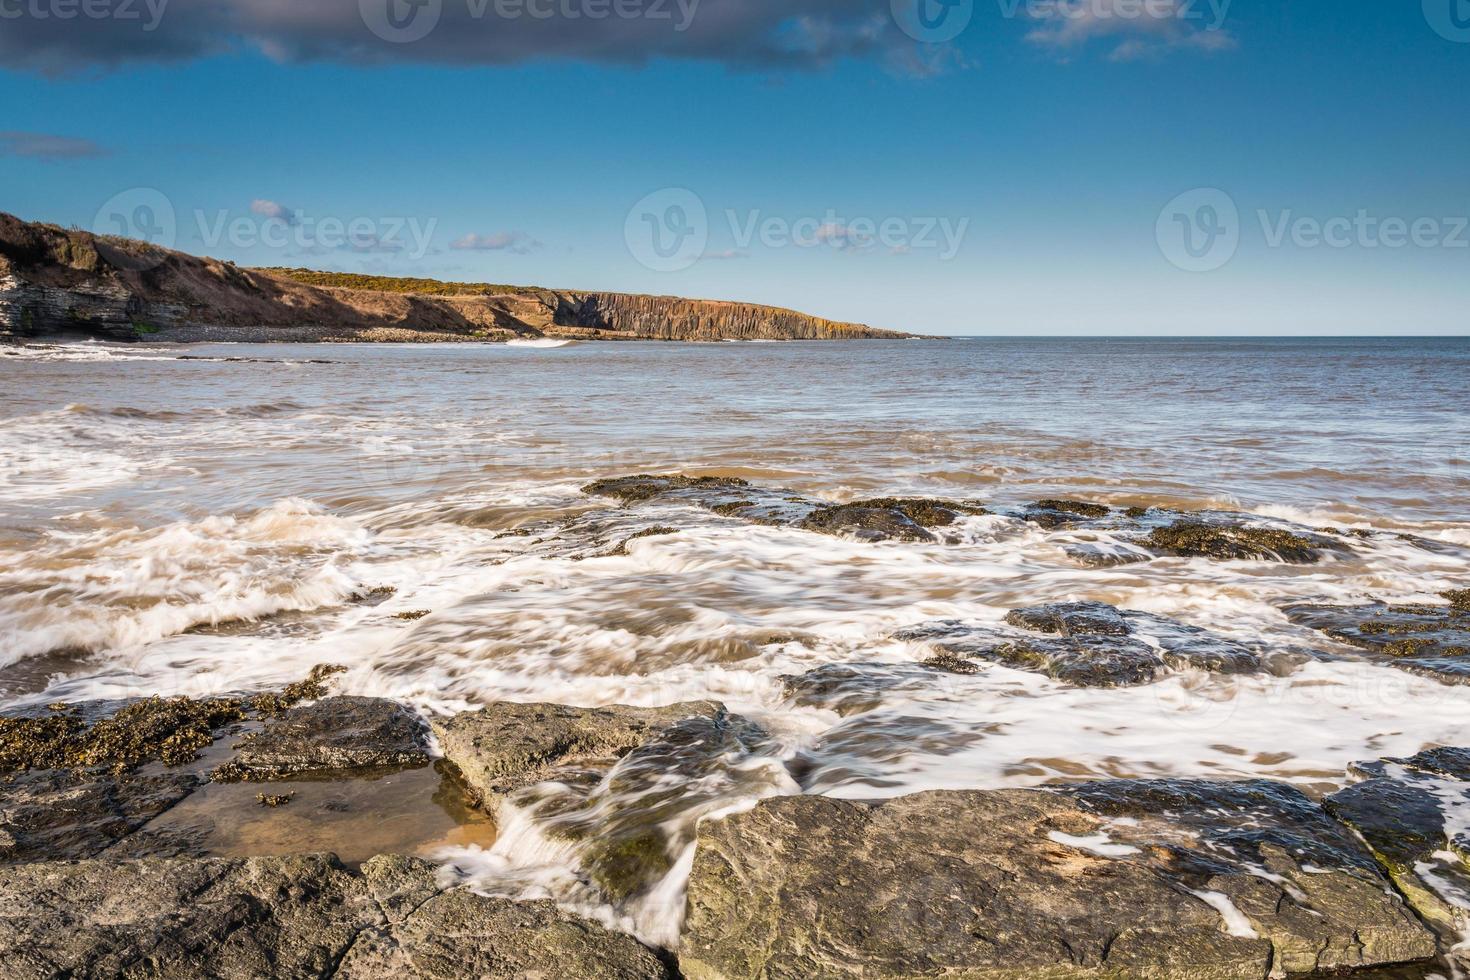 marea in arrivo nel punto cullernose foto